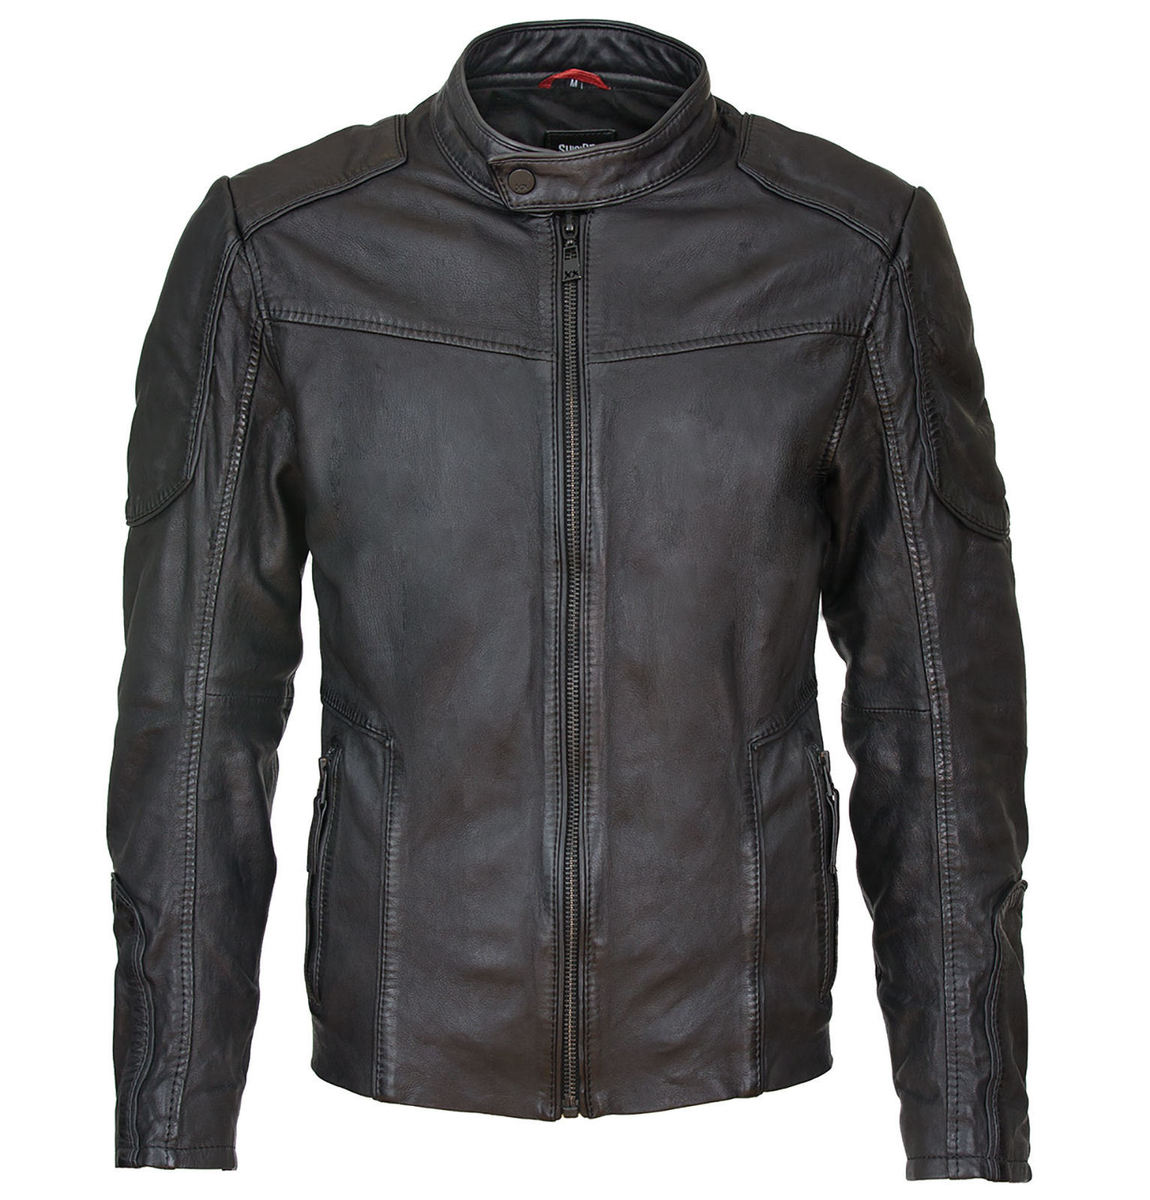 bunda pánská Suicide Squad Leather Jacket Deadshot Black - MRT-SQ-16-MSJ-02-BLK